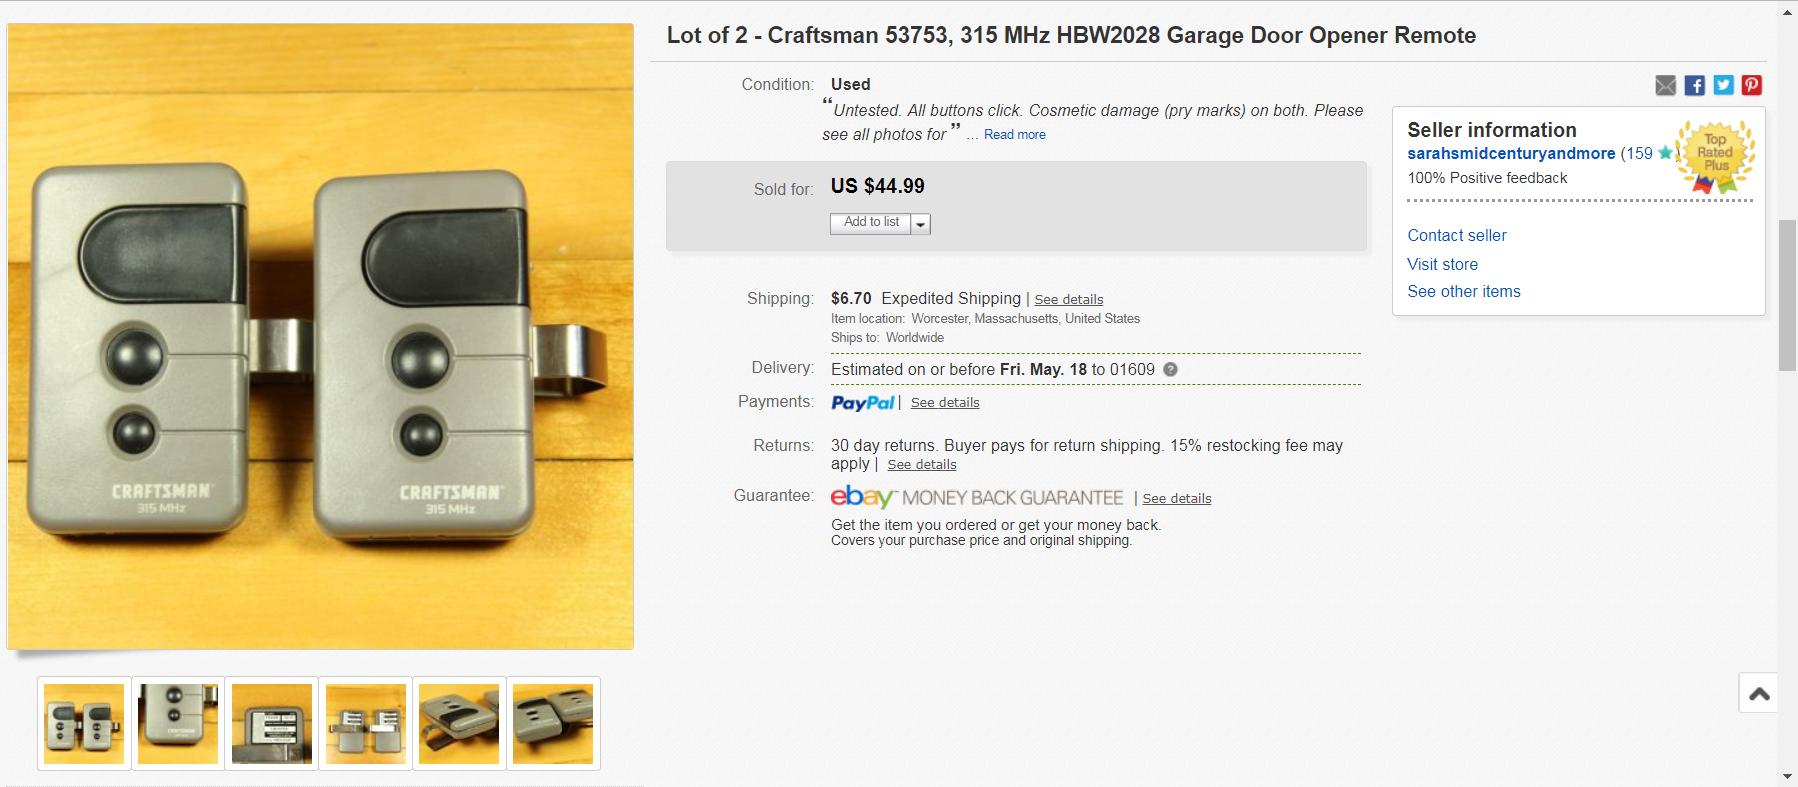 Free Sold For 44 99 To Iubock Tx Garage Door Opener Remote Selling On Ebay Ebay